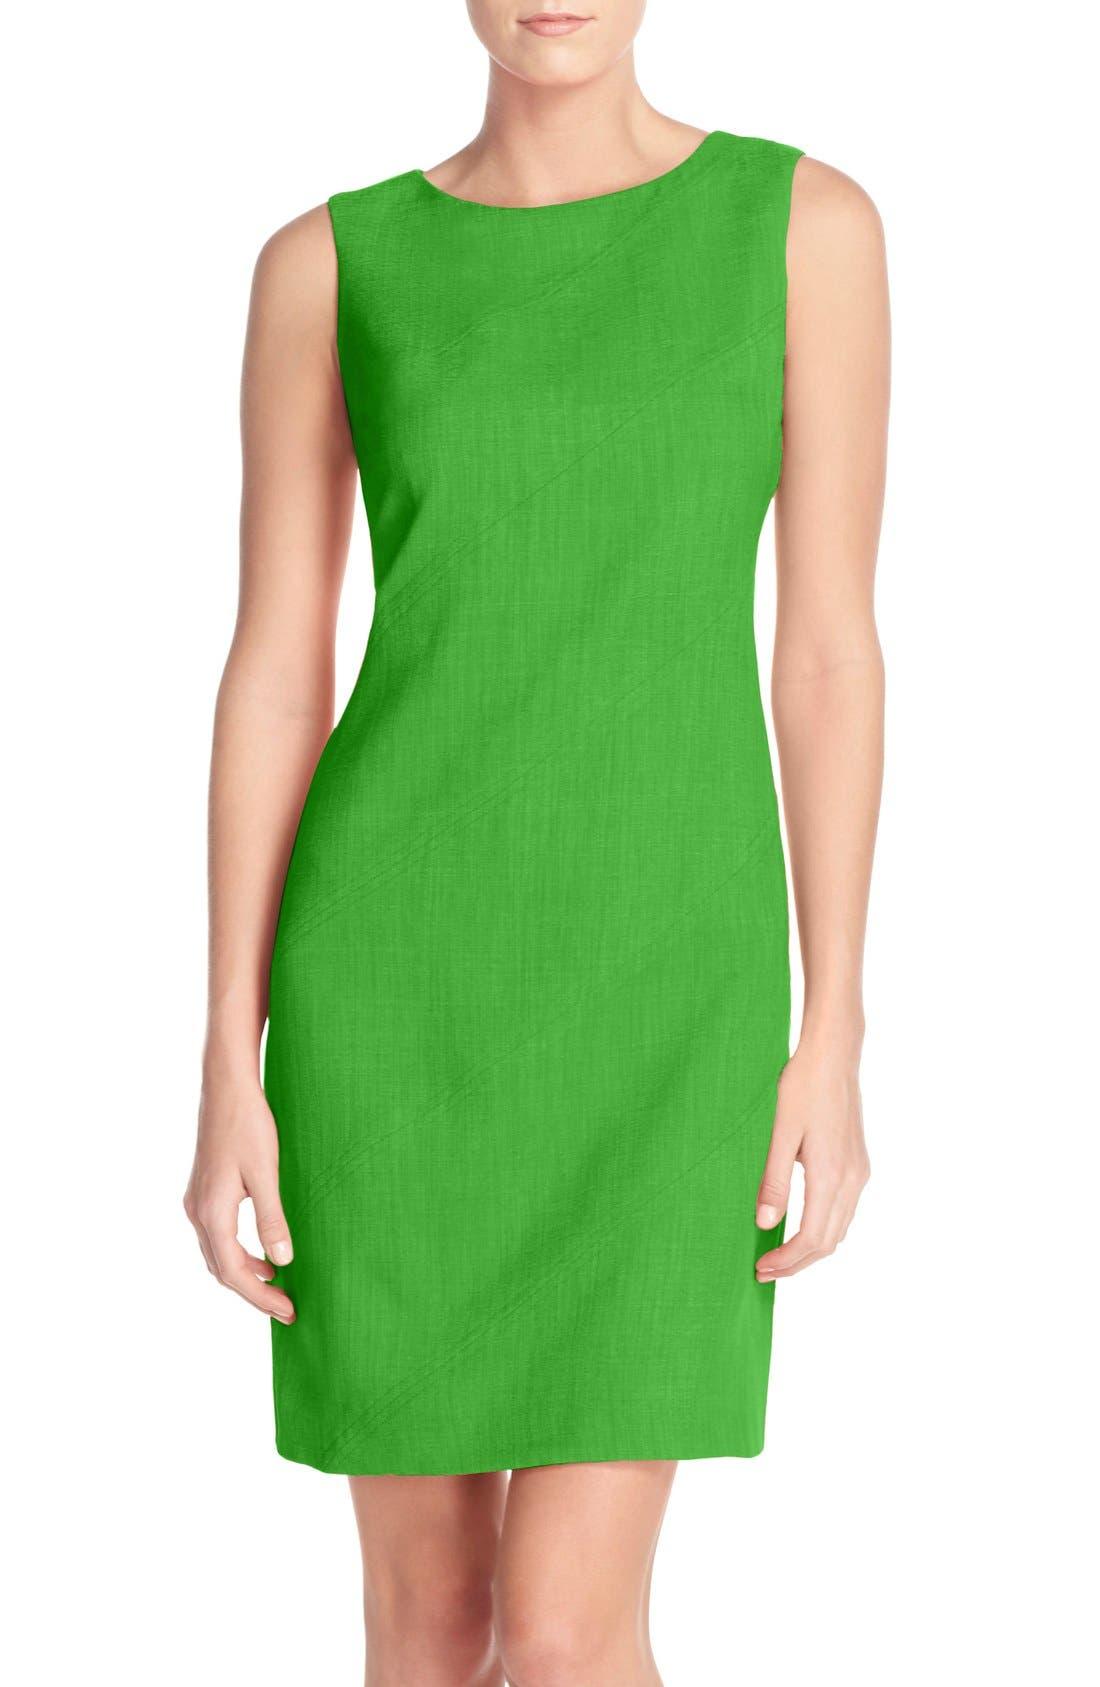 Alternate Image 1 Selected - Ellen Tracy Seam Sheath Dress (Regular & Petite)